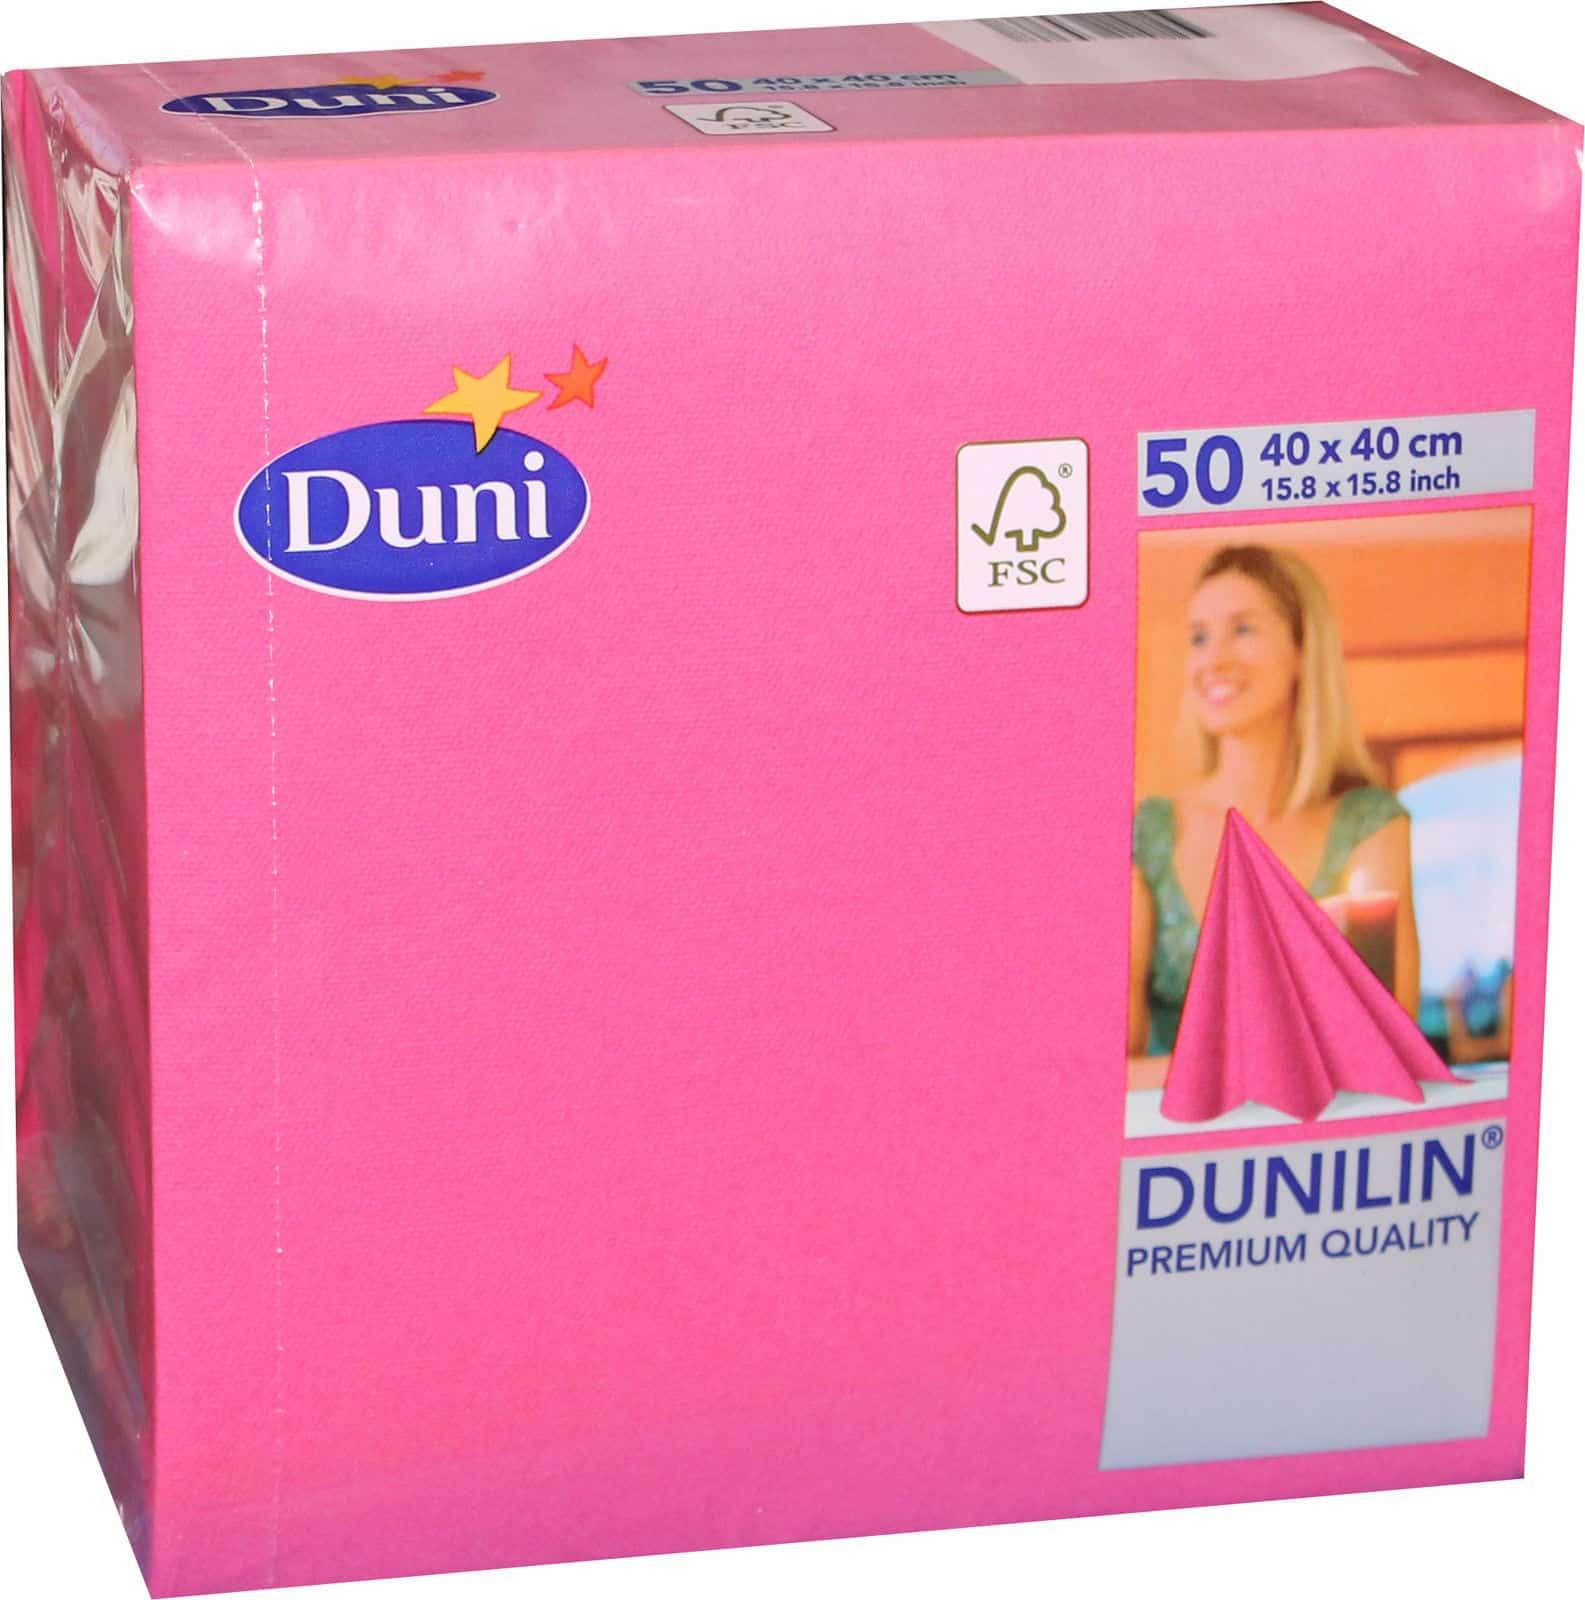 50 duni dunilin 165386 gastro servietten 40 x 40 cm tischdeko fuchsia pink neu. Black Bedroom Furniture Sets. Home Design Ideas